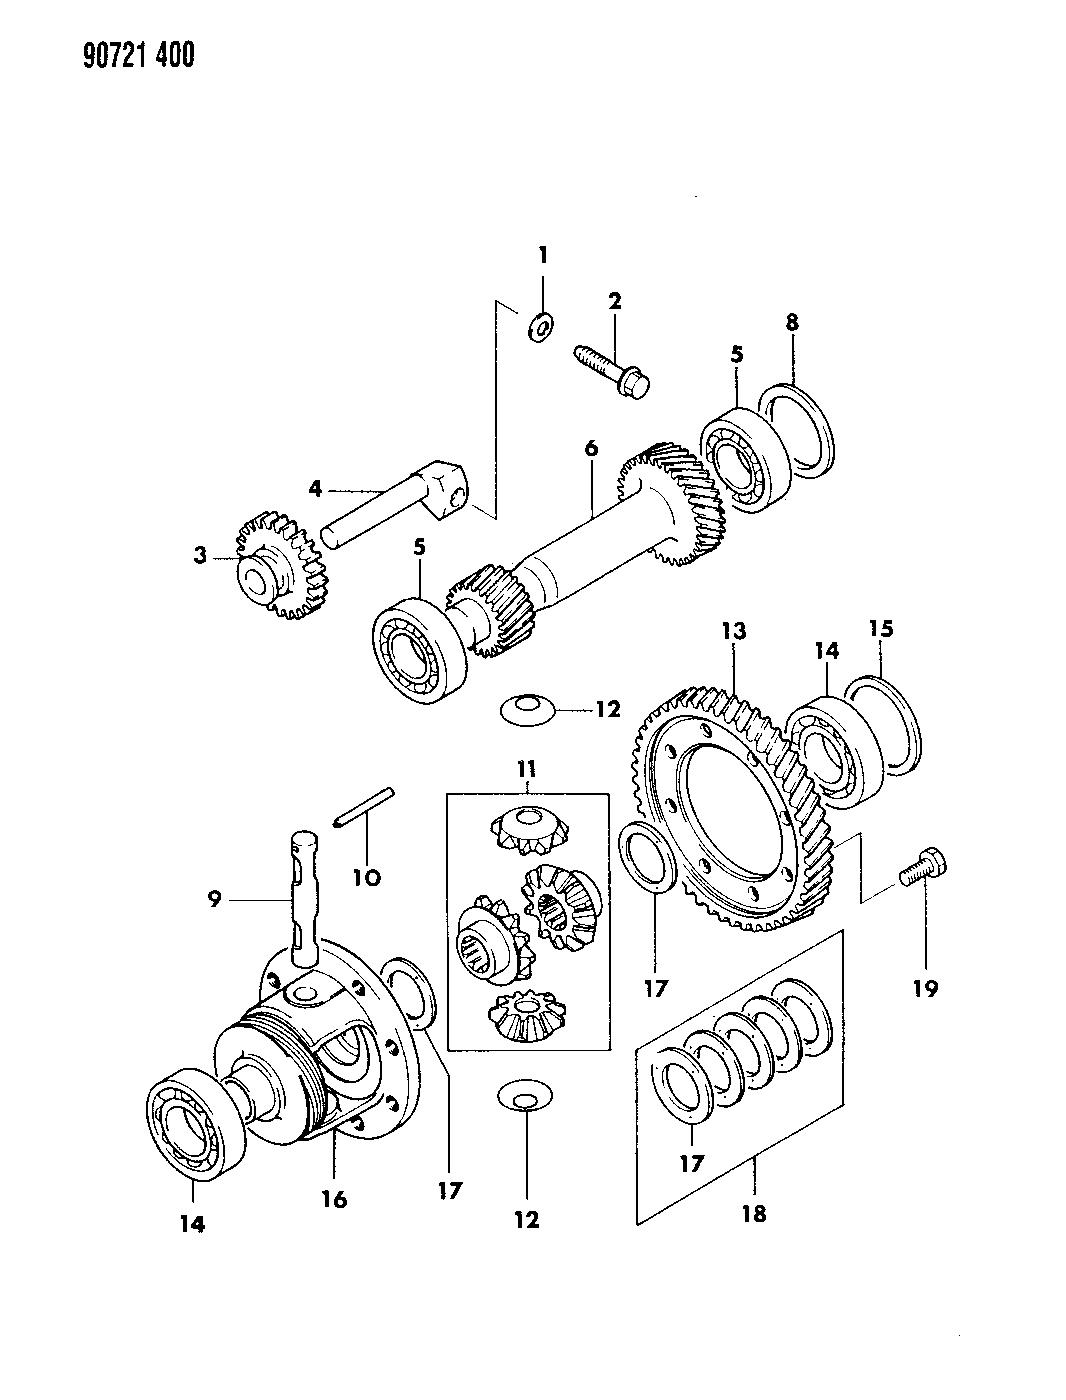 1990 Dodge Colt Gears & Output Shaft